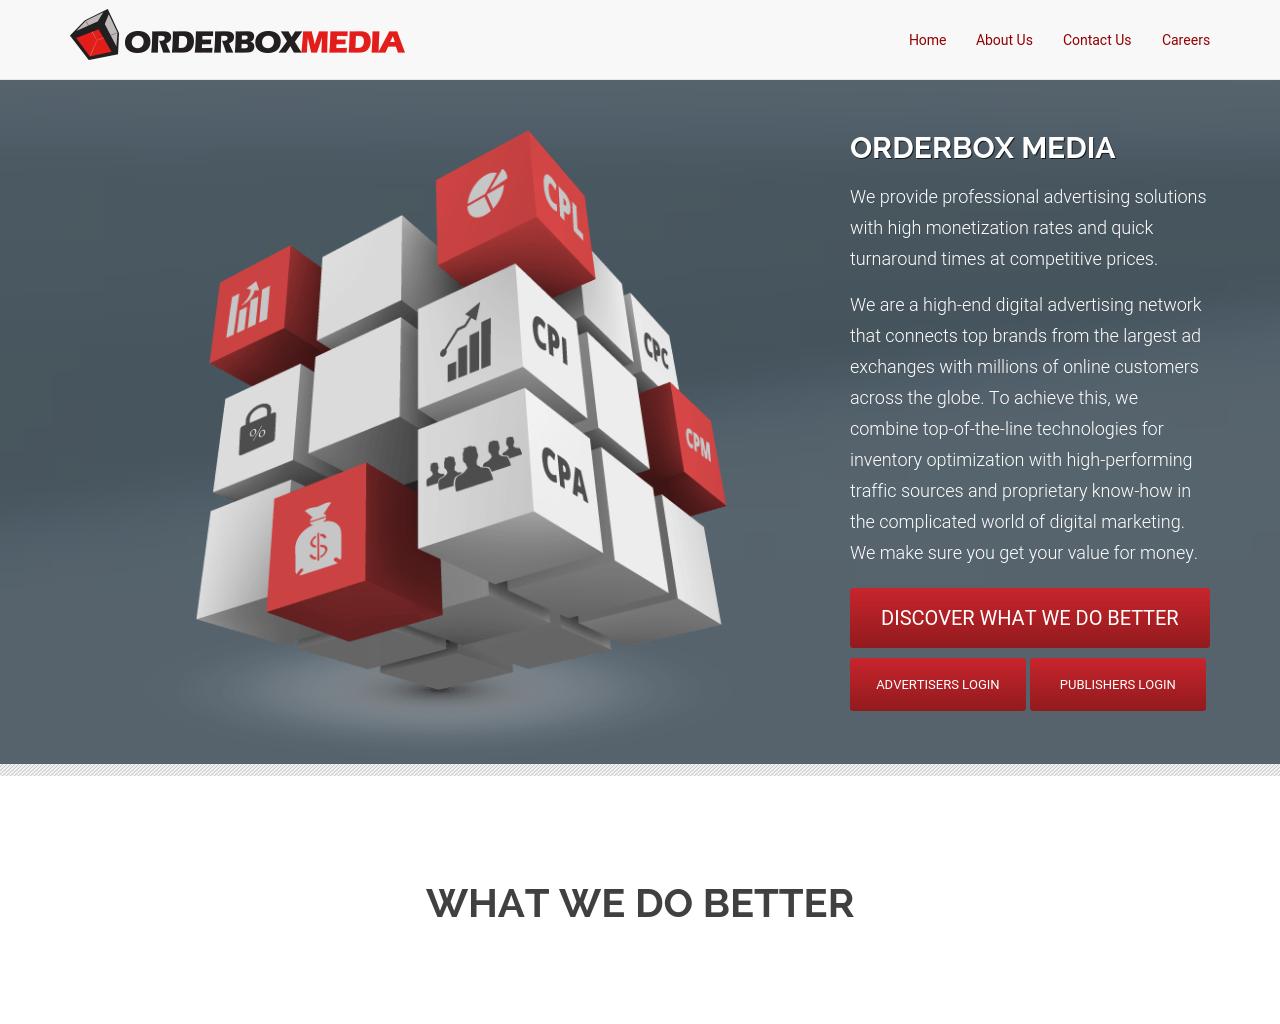 Orderbox-Media-Advertising-Reviews-Pricing